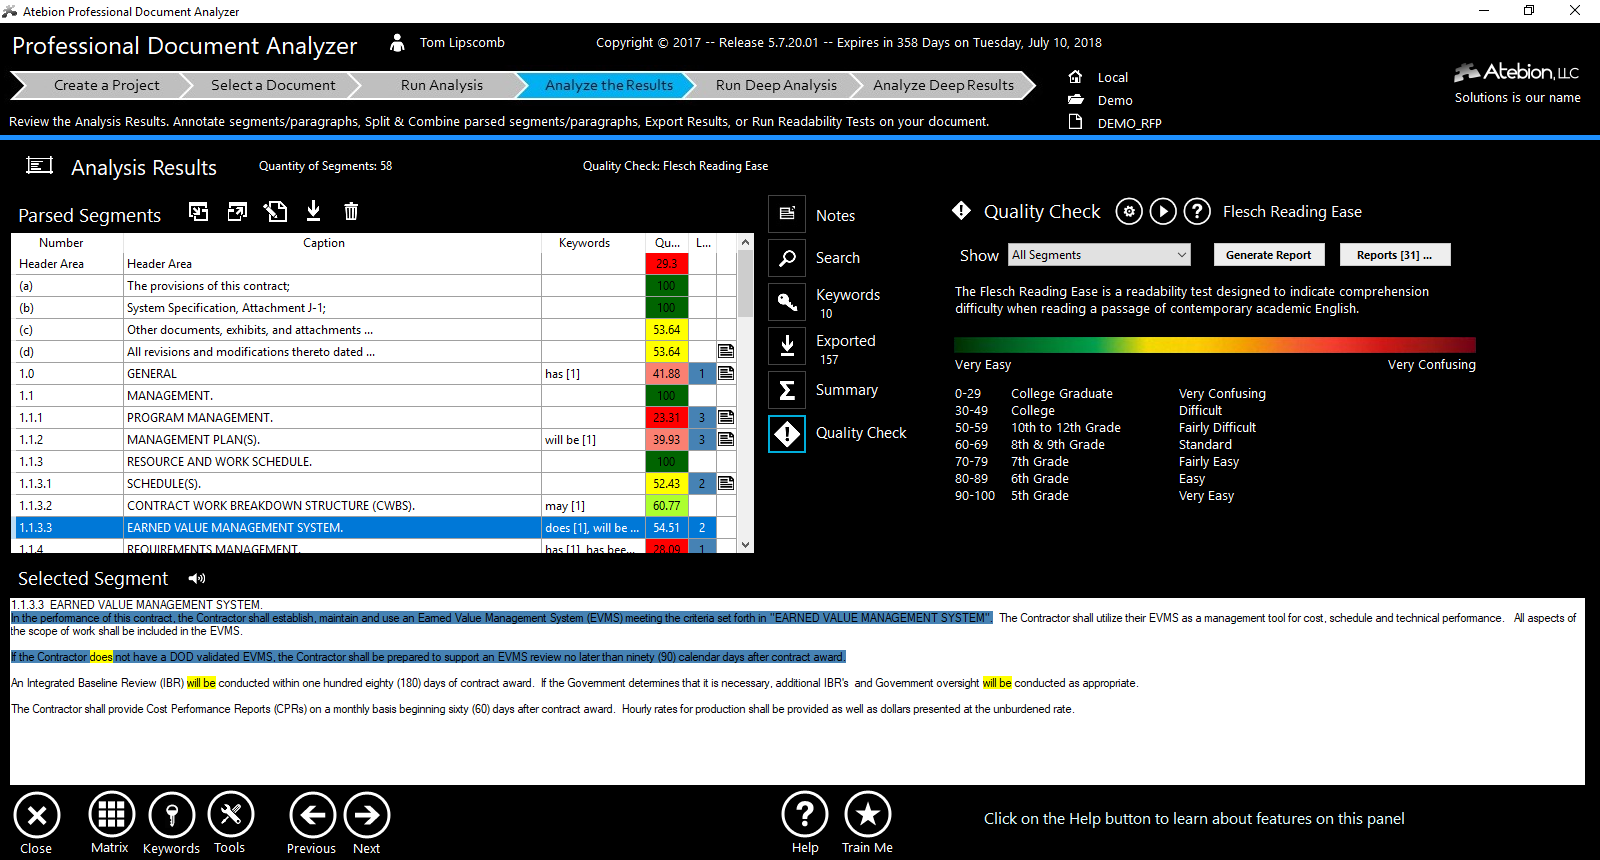 shred rfps keywords build compliance matrix amp proposal